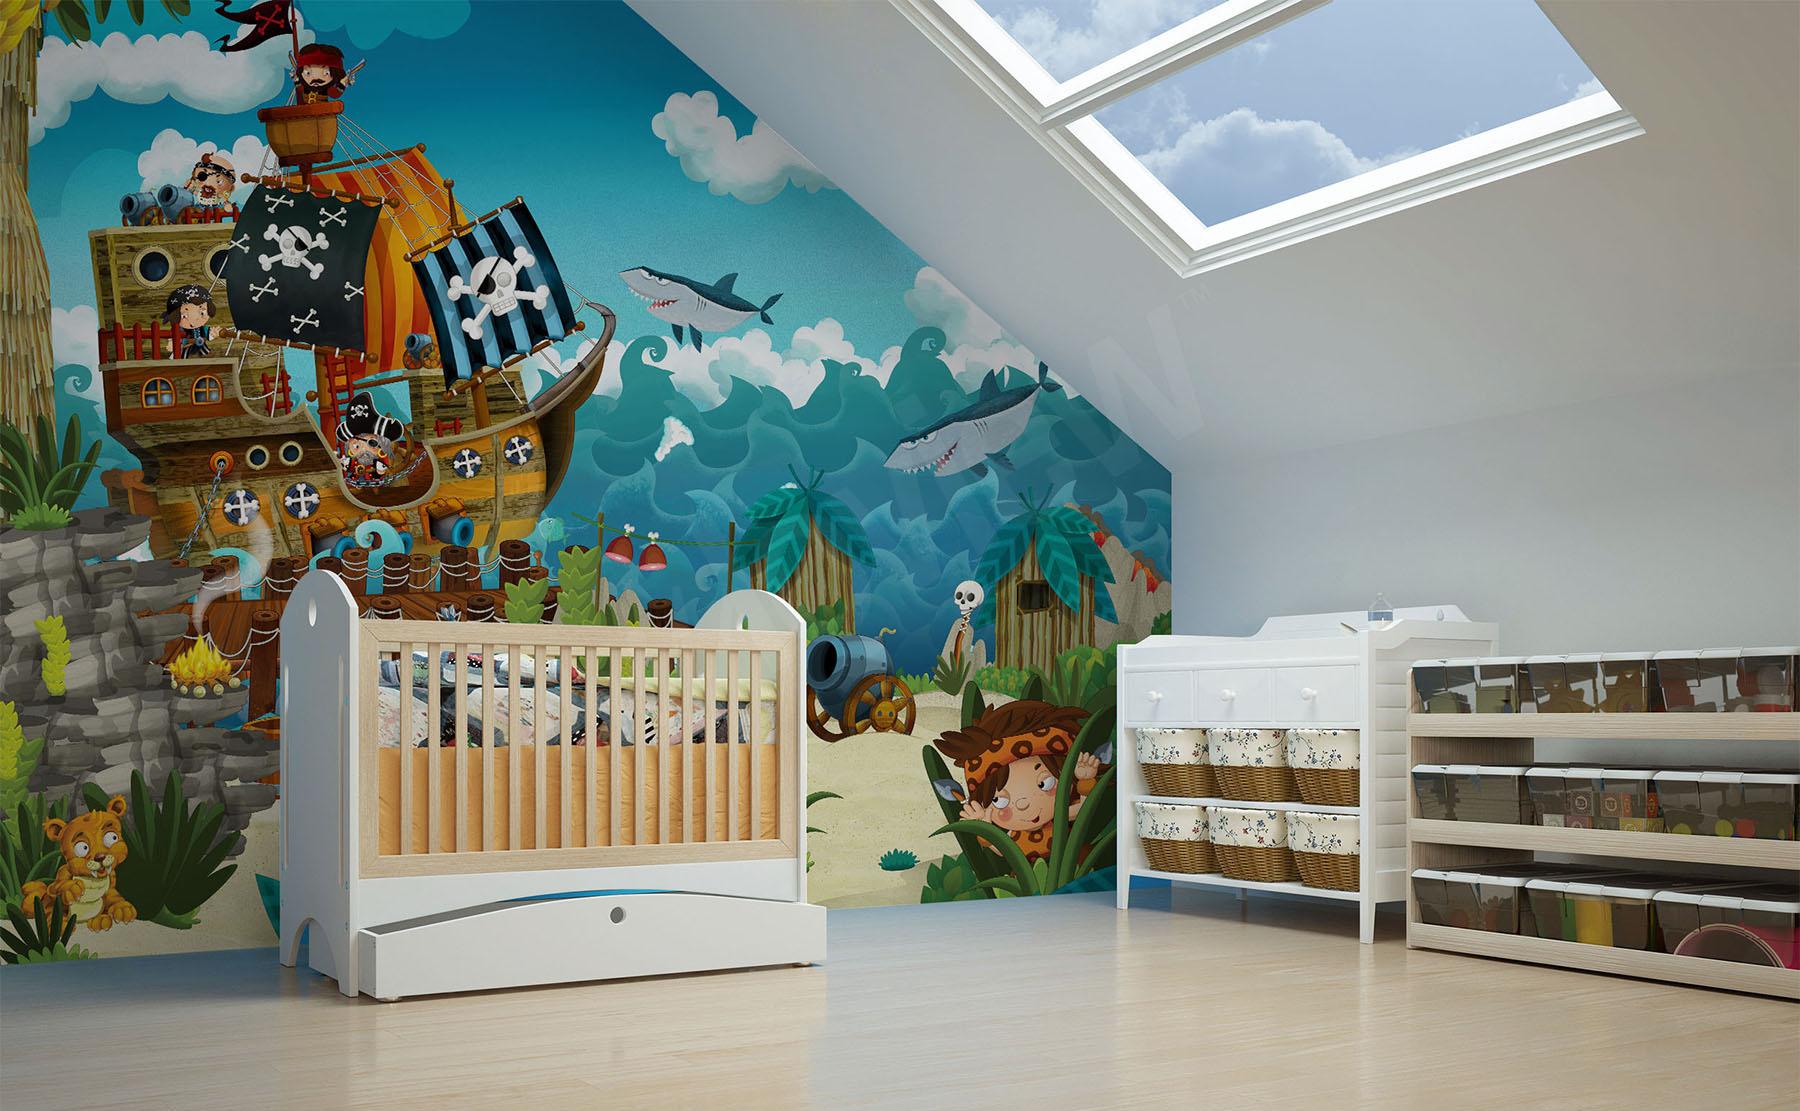 Full Size of Fototapeten Kinderzimmer Fototapete Groe Auswahl Regal Weiß Wohnzimmer Regale Sofa Kinderzimmer Fototapeten Kinderzimmer